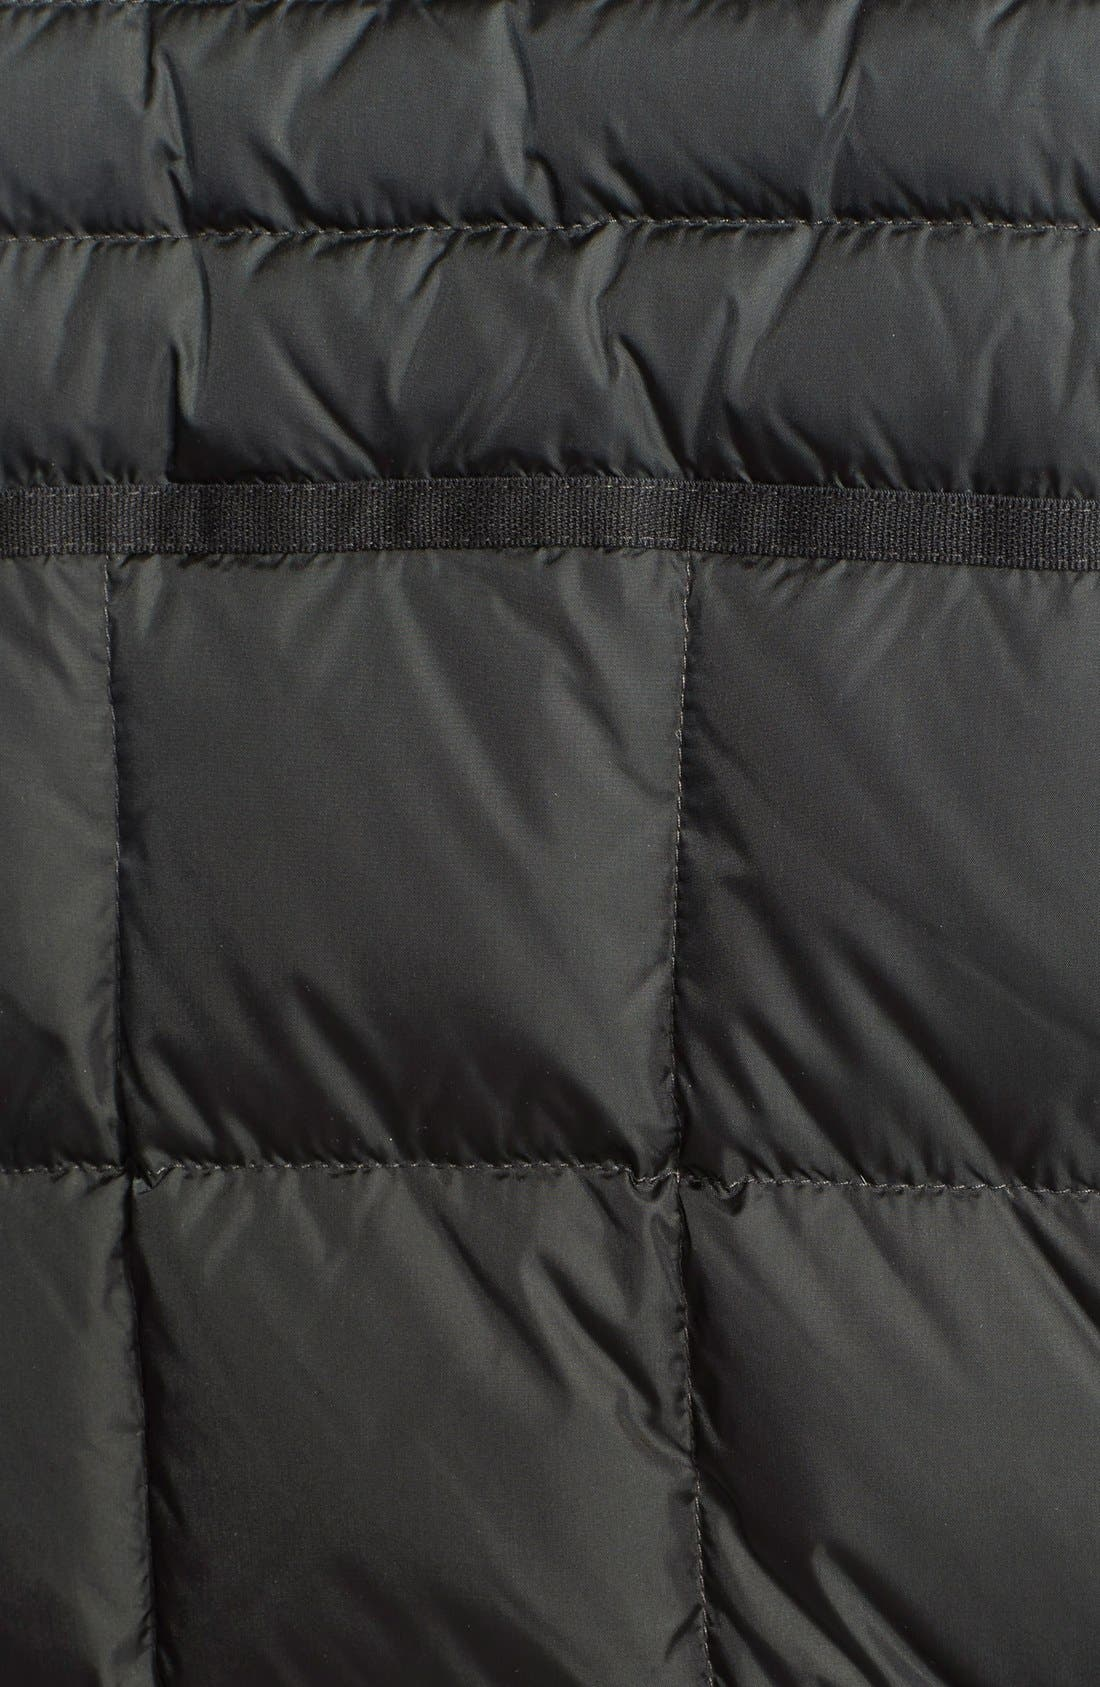 'Blais' Mixed Media Down Jacket,                             Alternate thumbnail 3, color,                             301